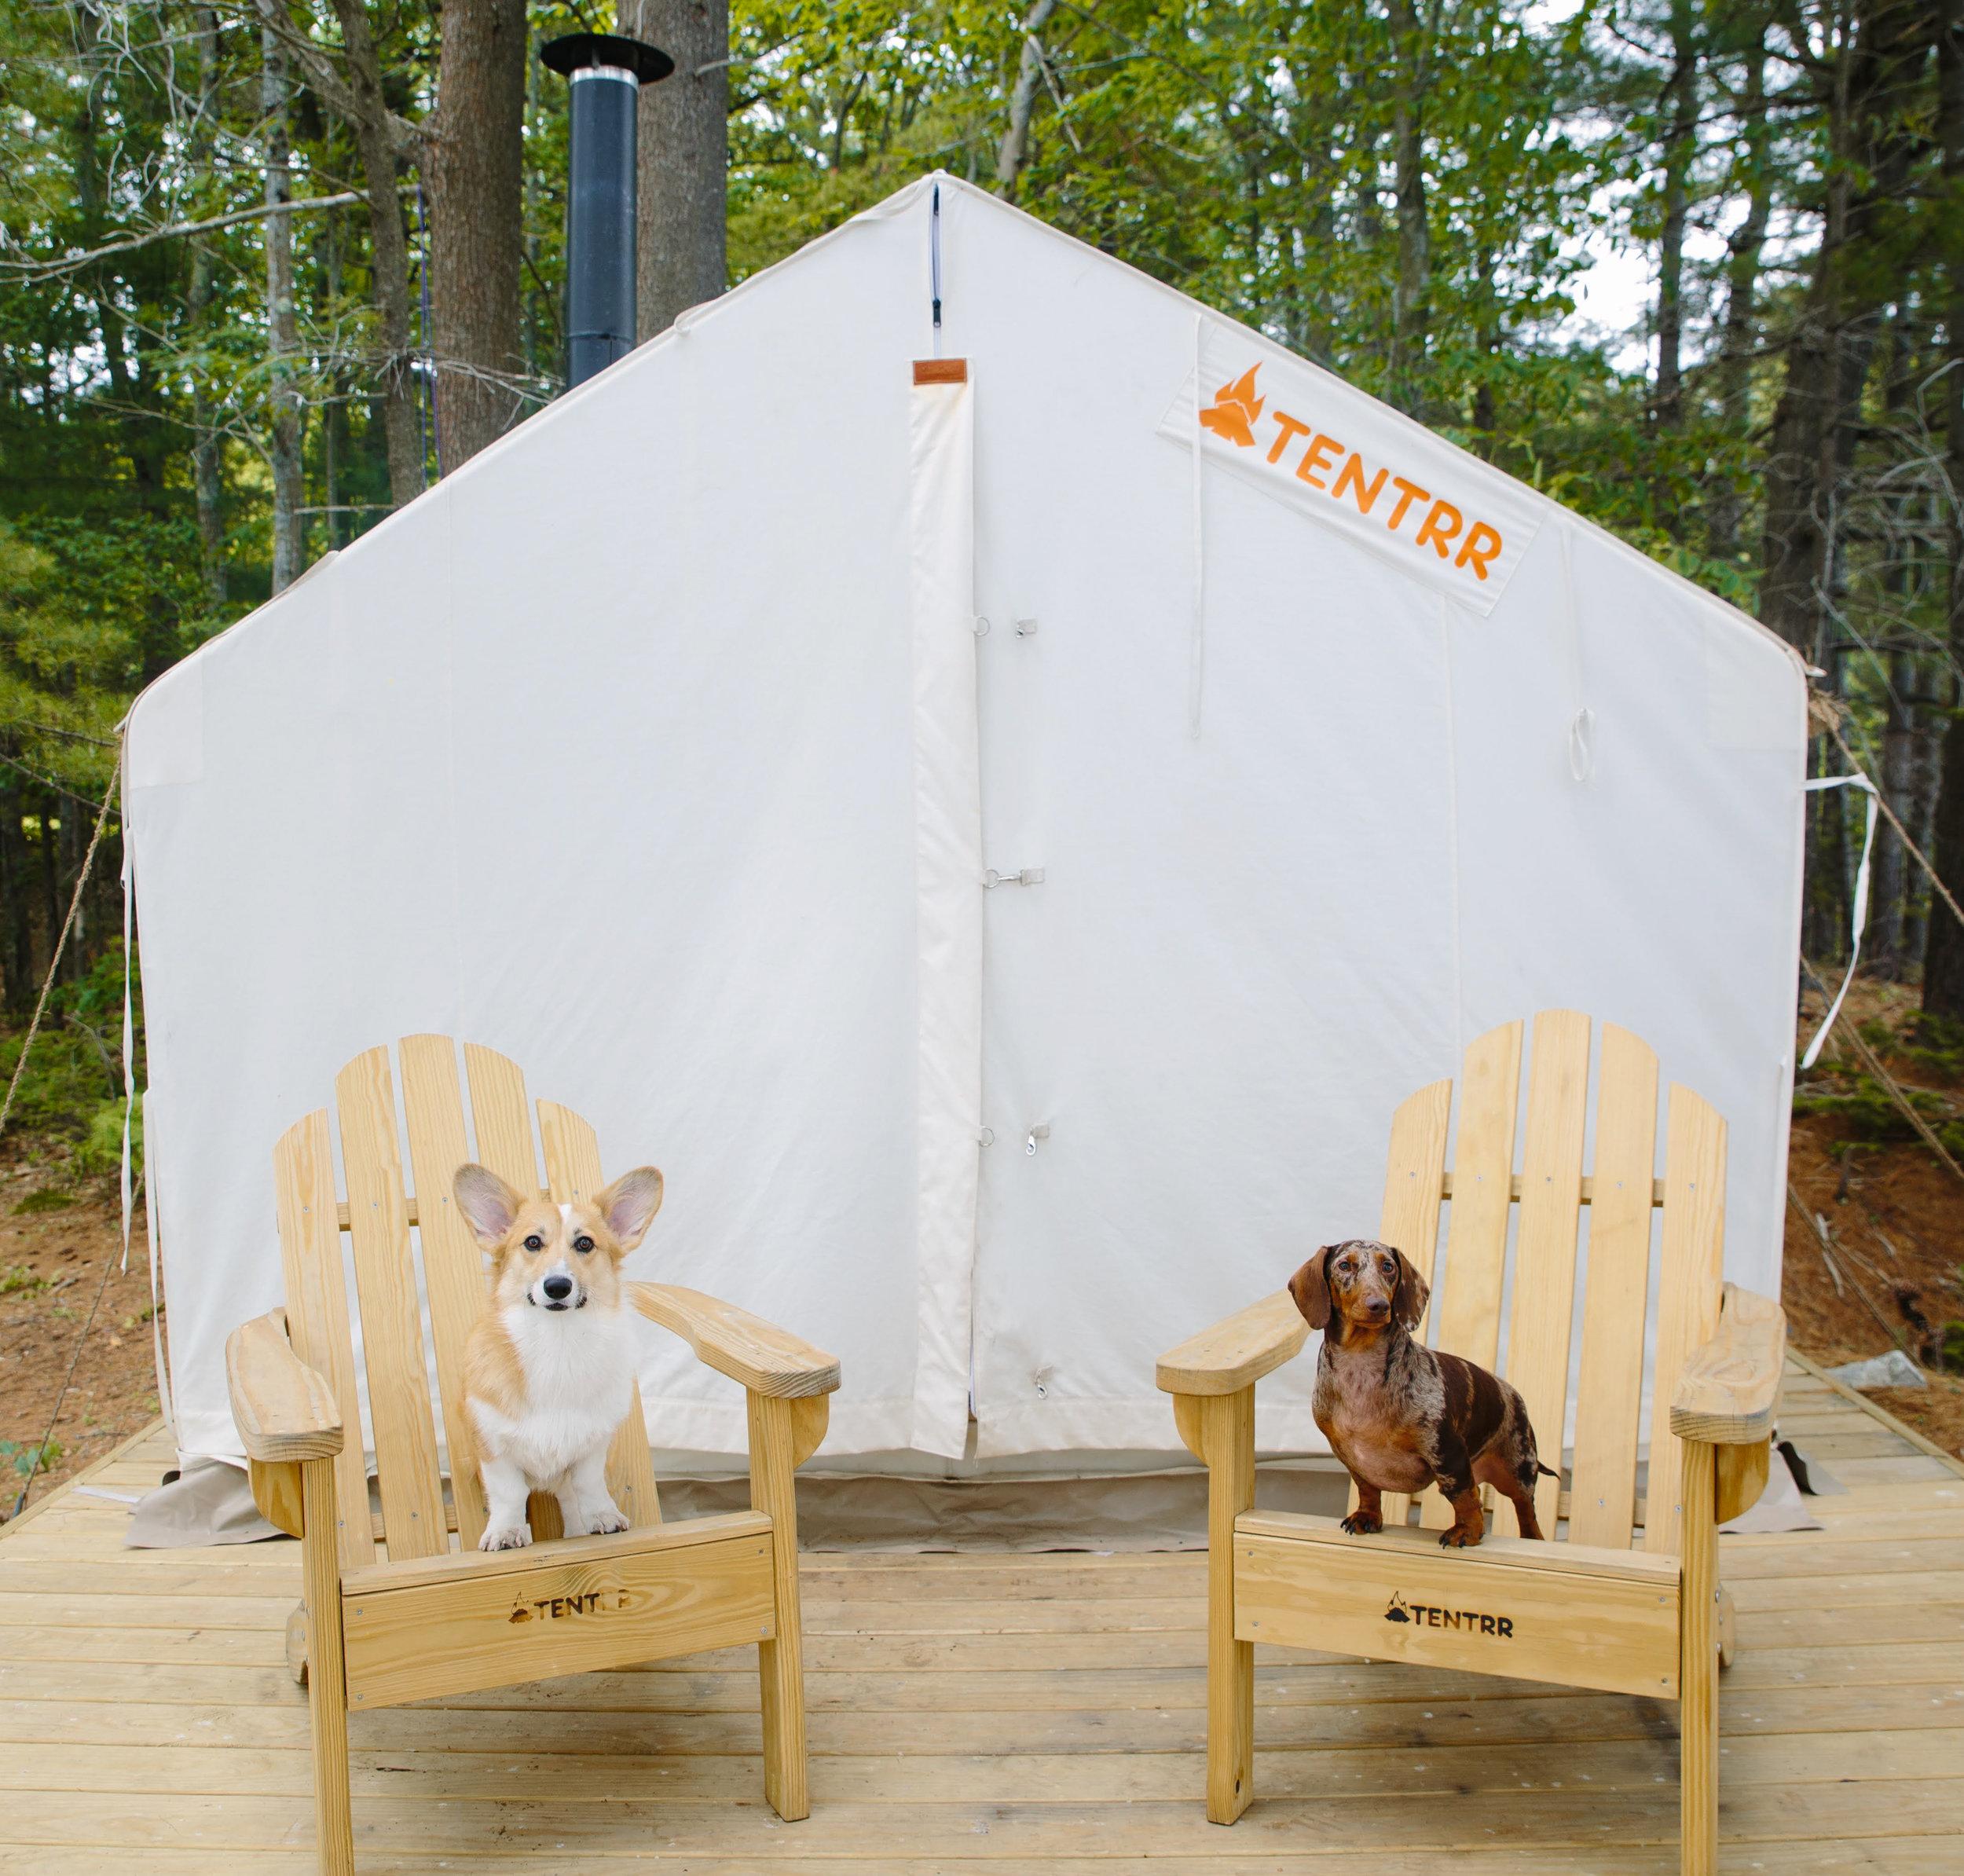 Our Tentrr tent